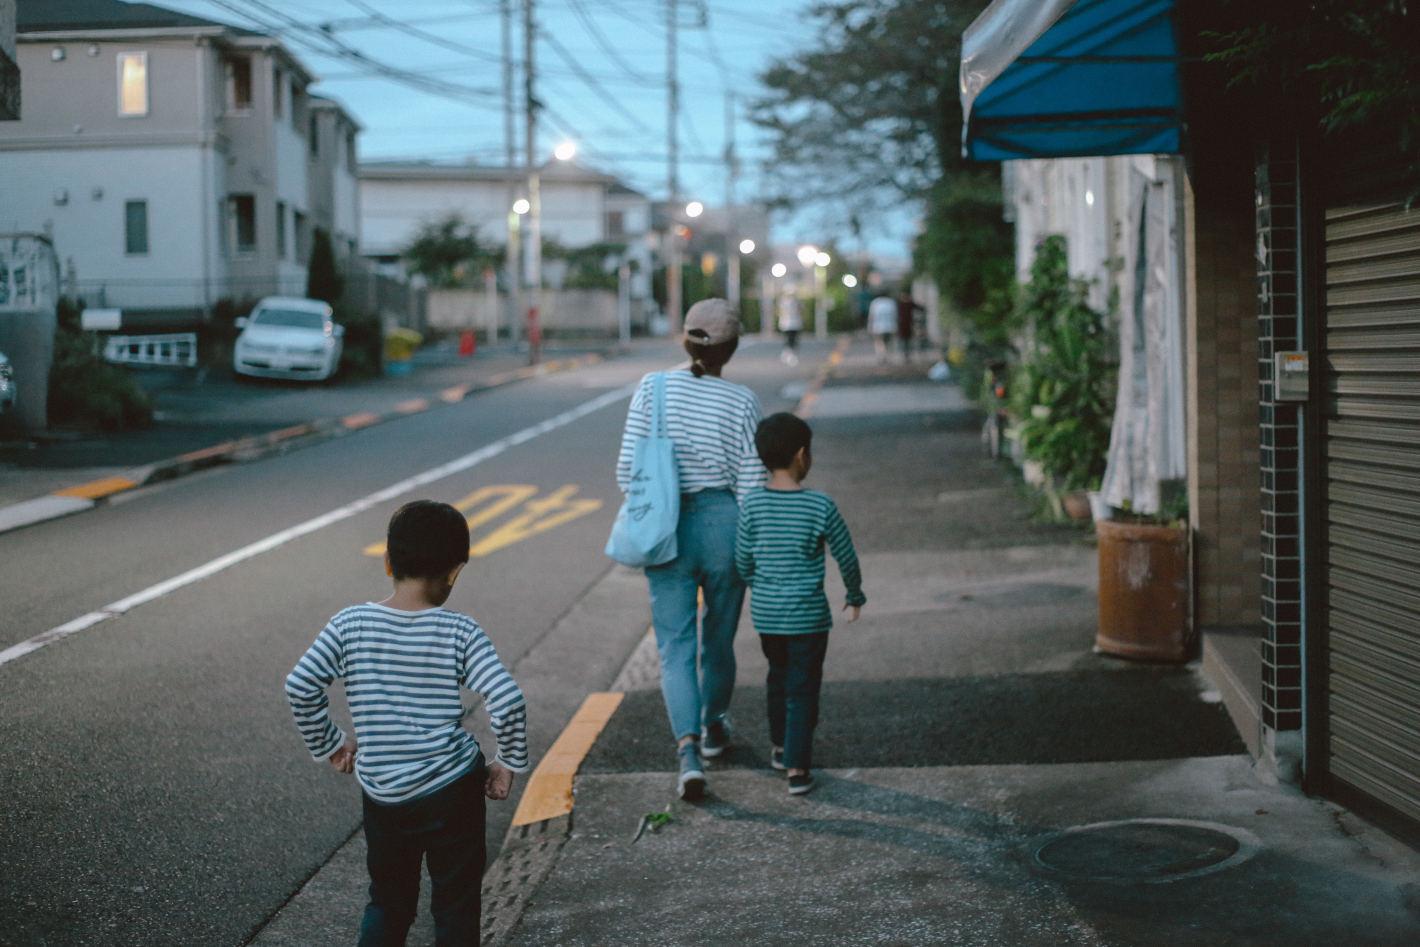 photo by 嵐田大志